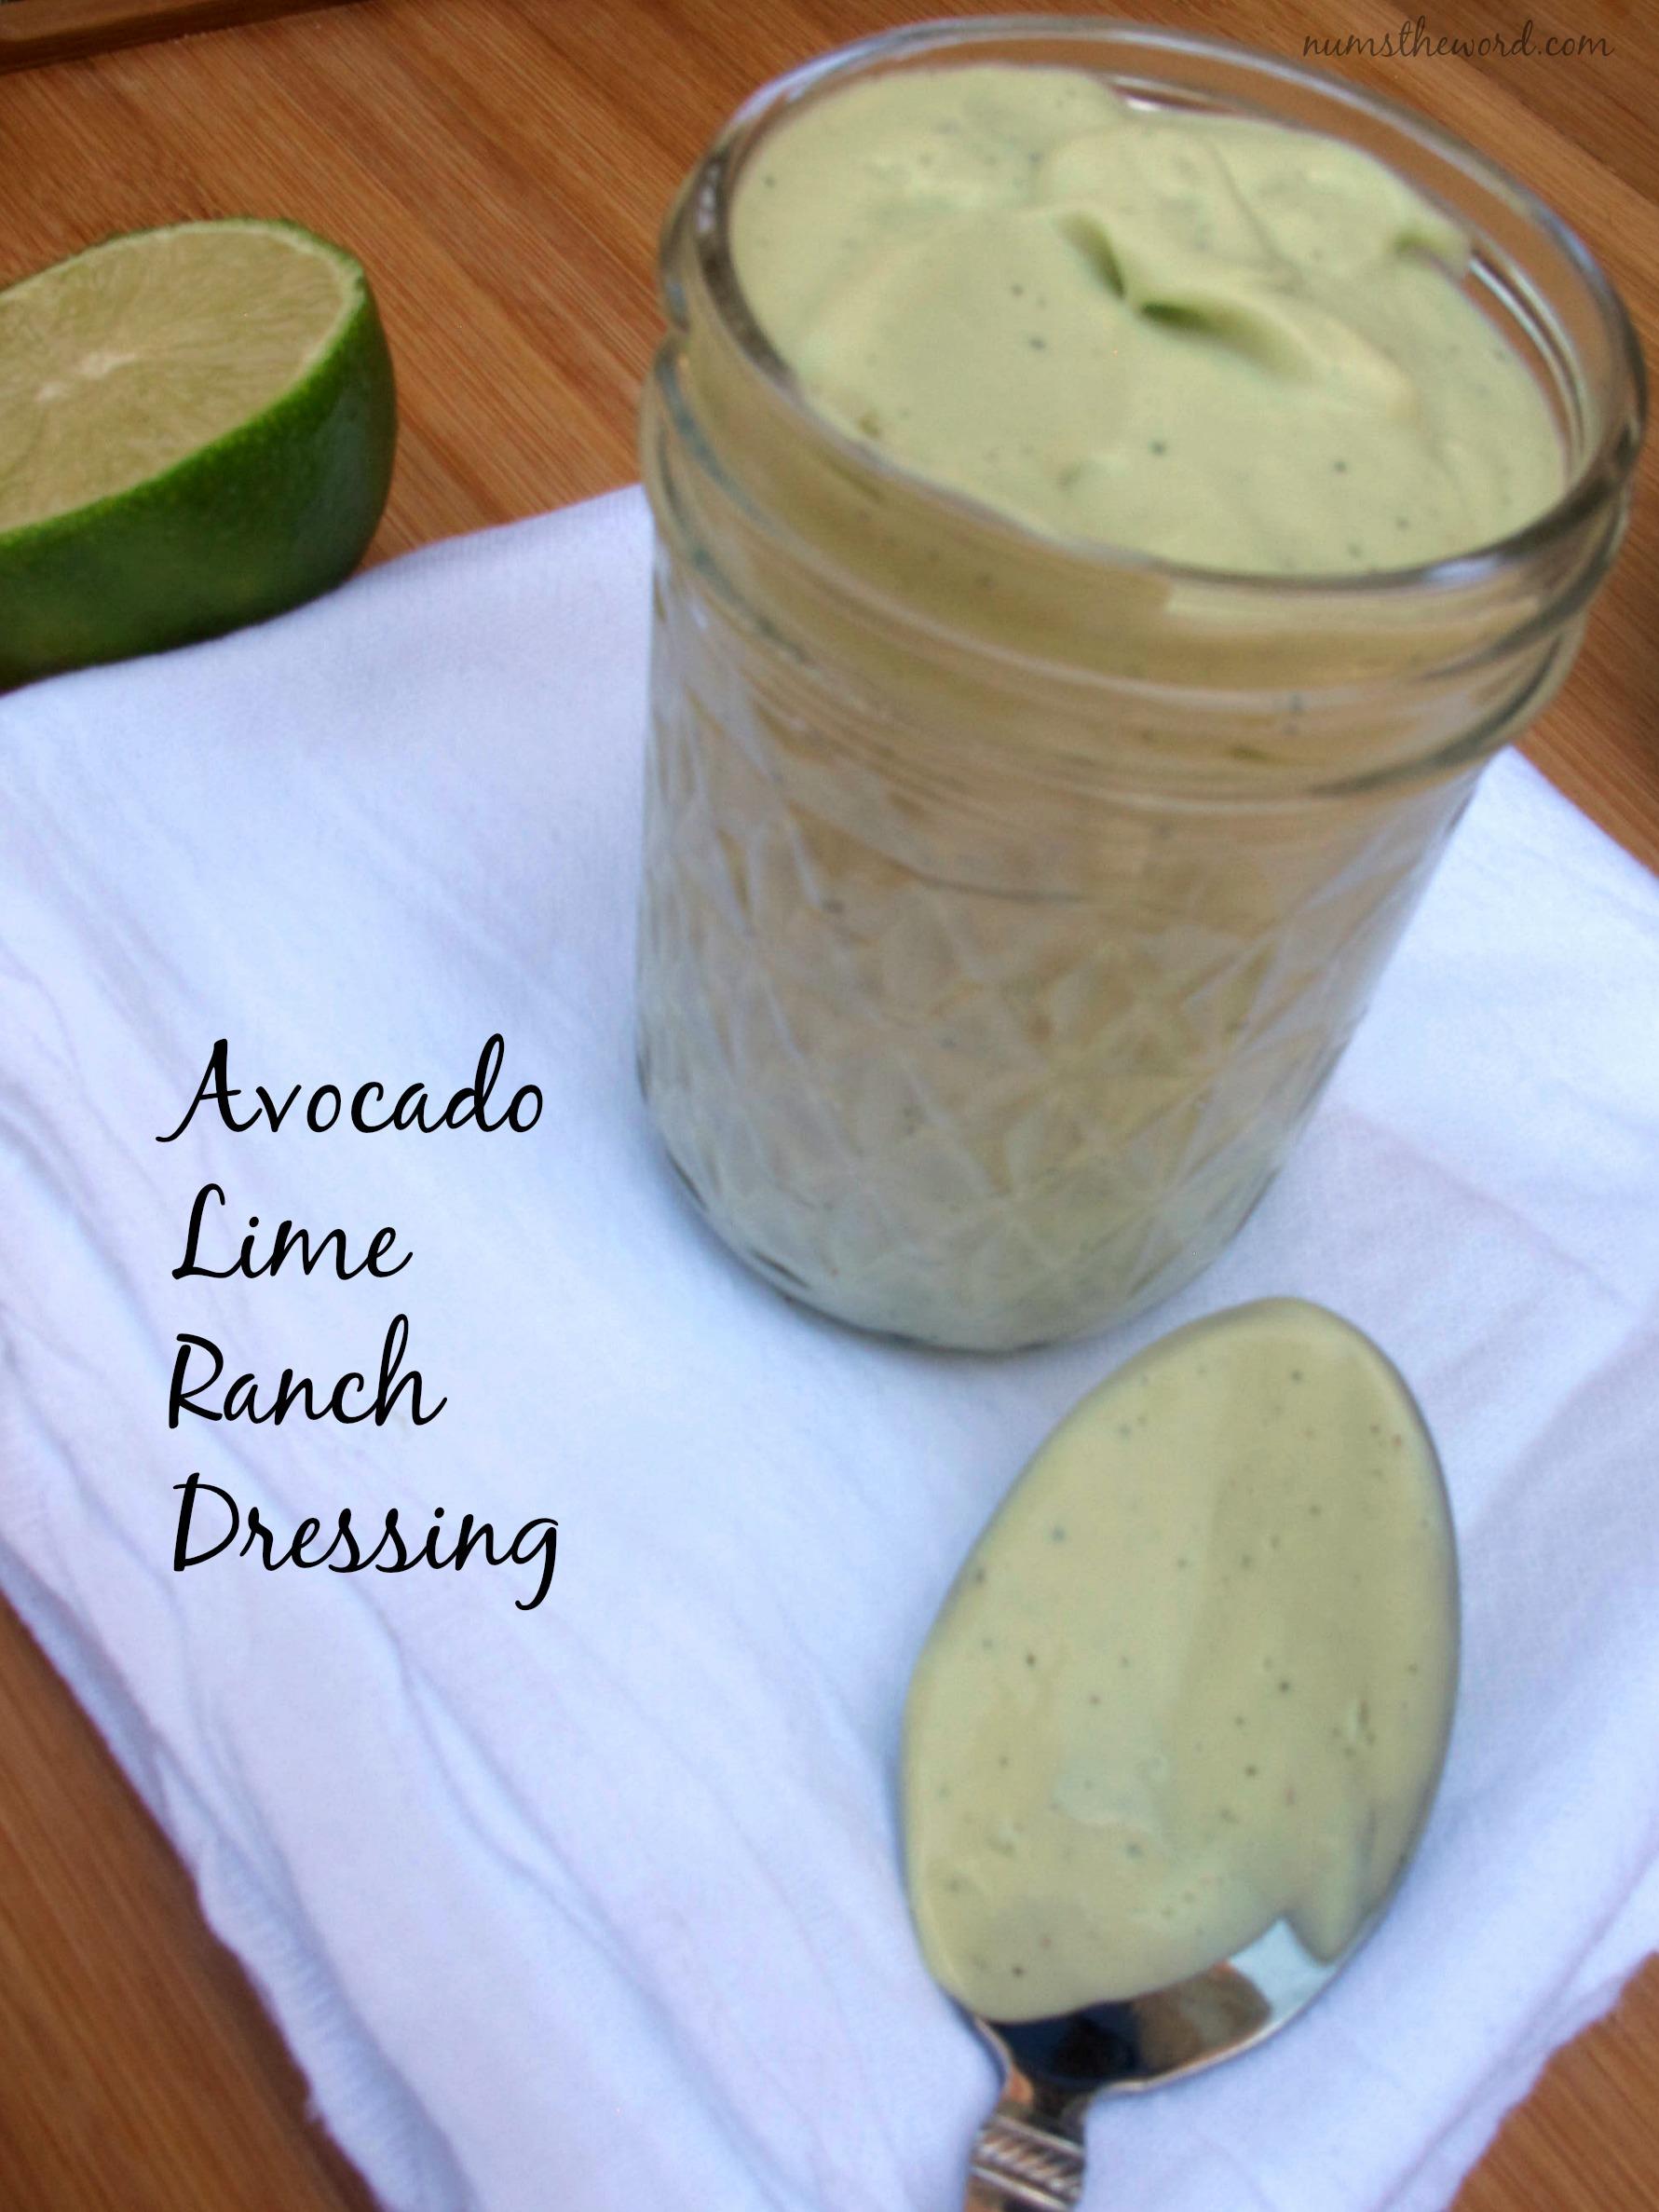 Avocado Lime Ranch Dressing